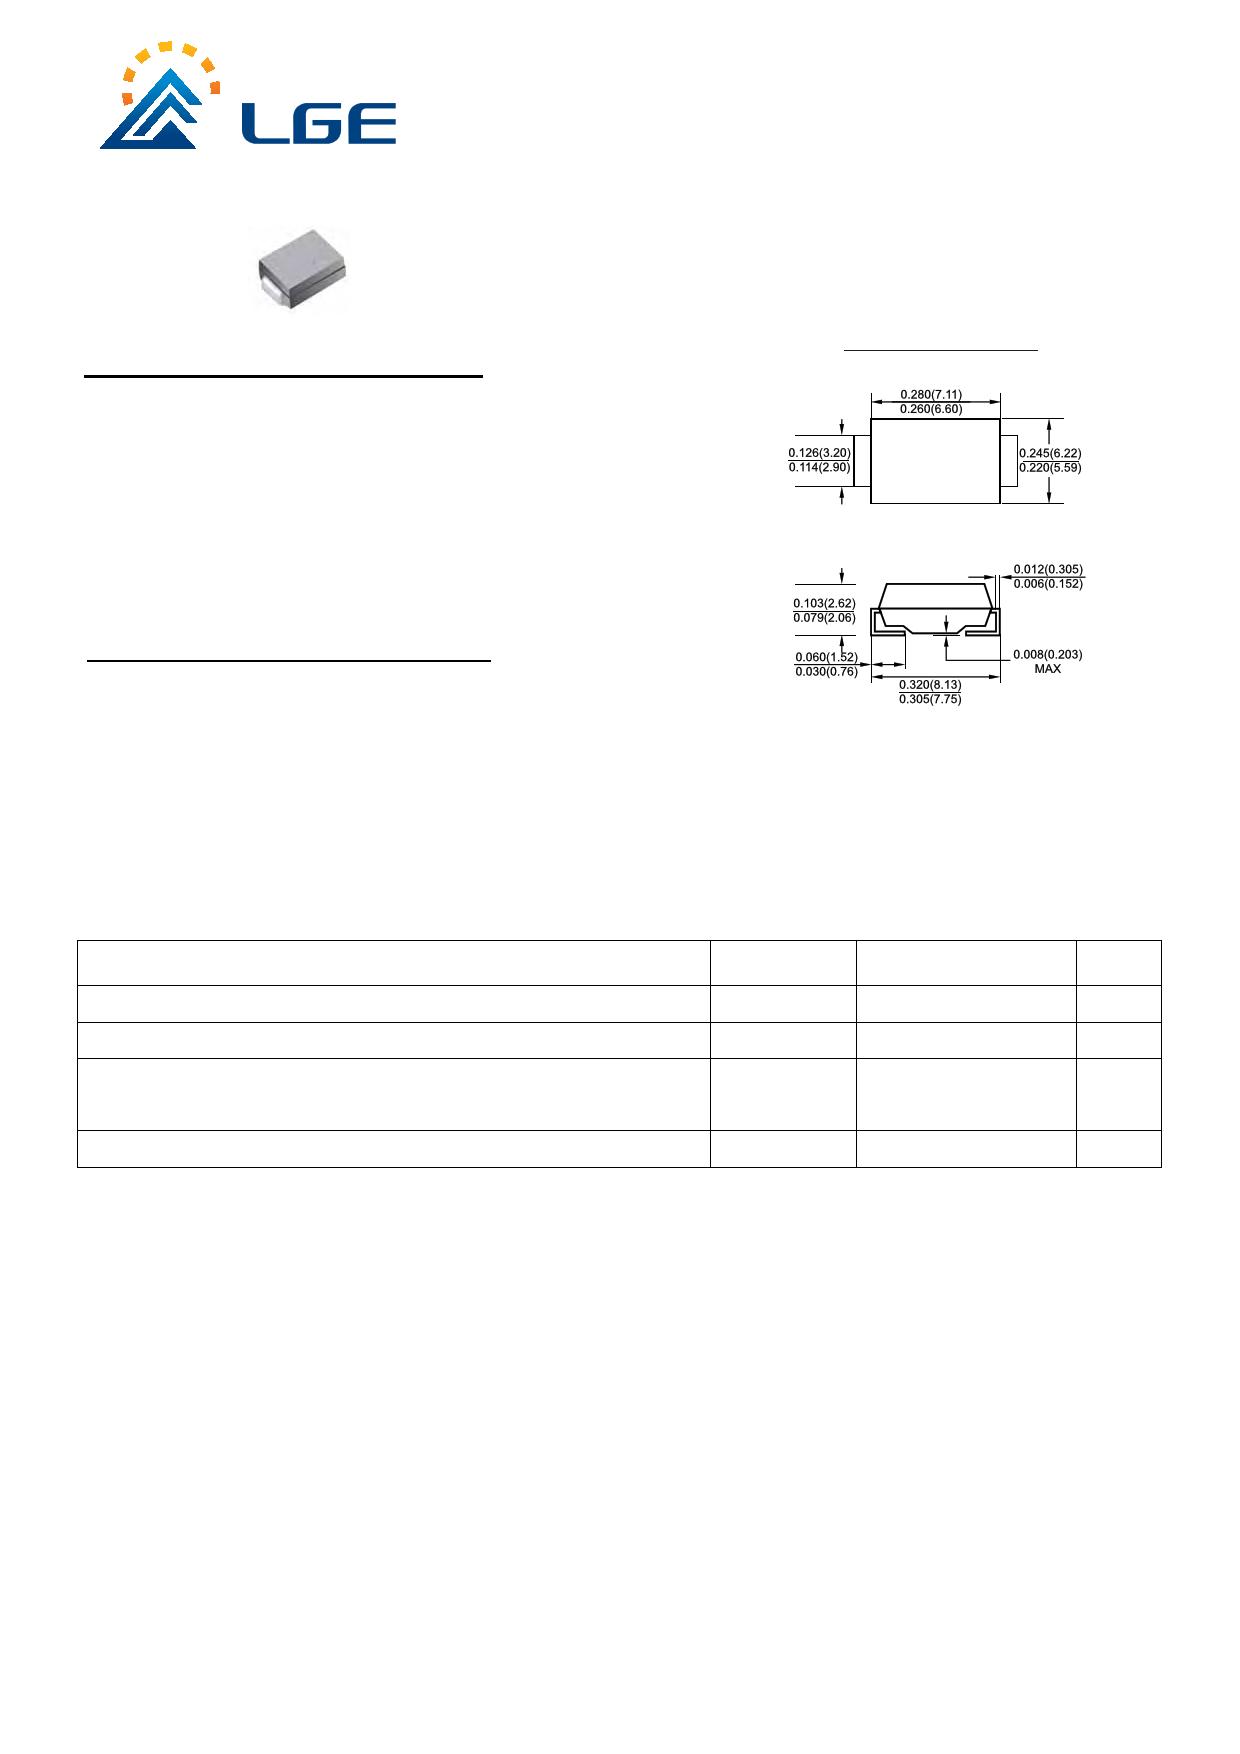 3.0SMCJ130CA Datasheet, 3.0SMCJ130CA PDF,ピン配置, 機能